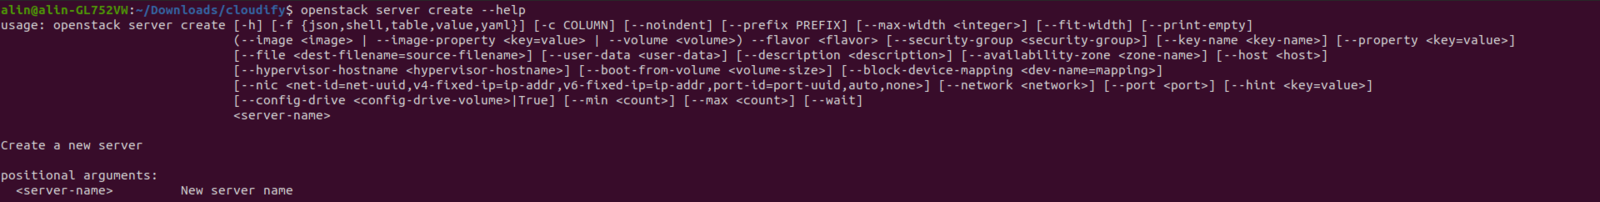 openstack server create